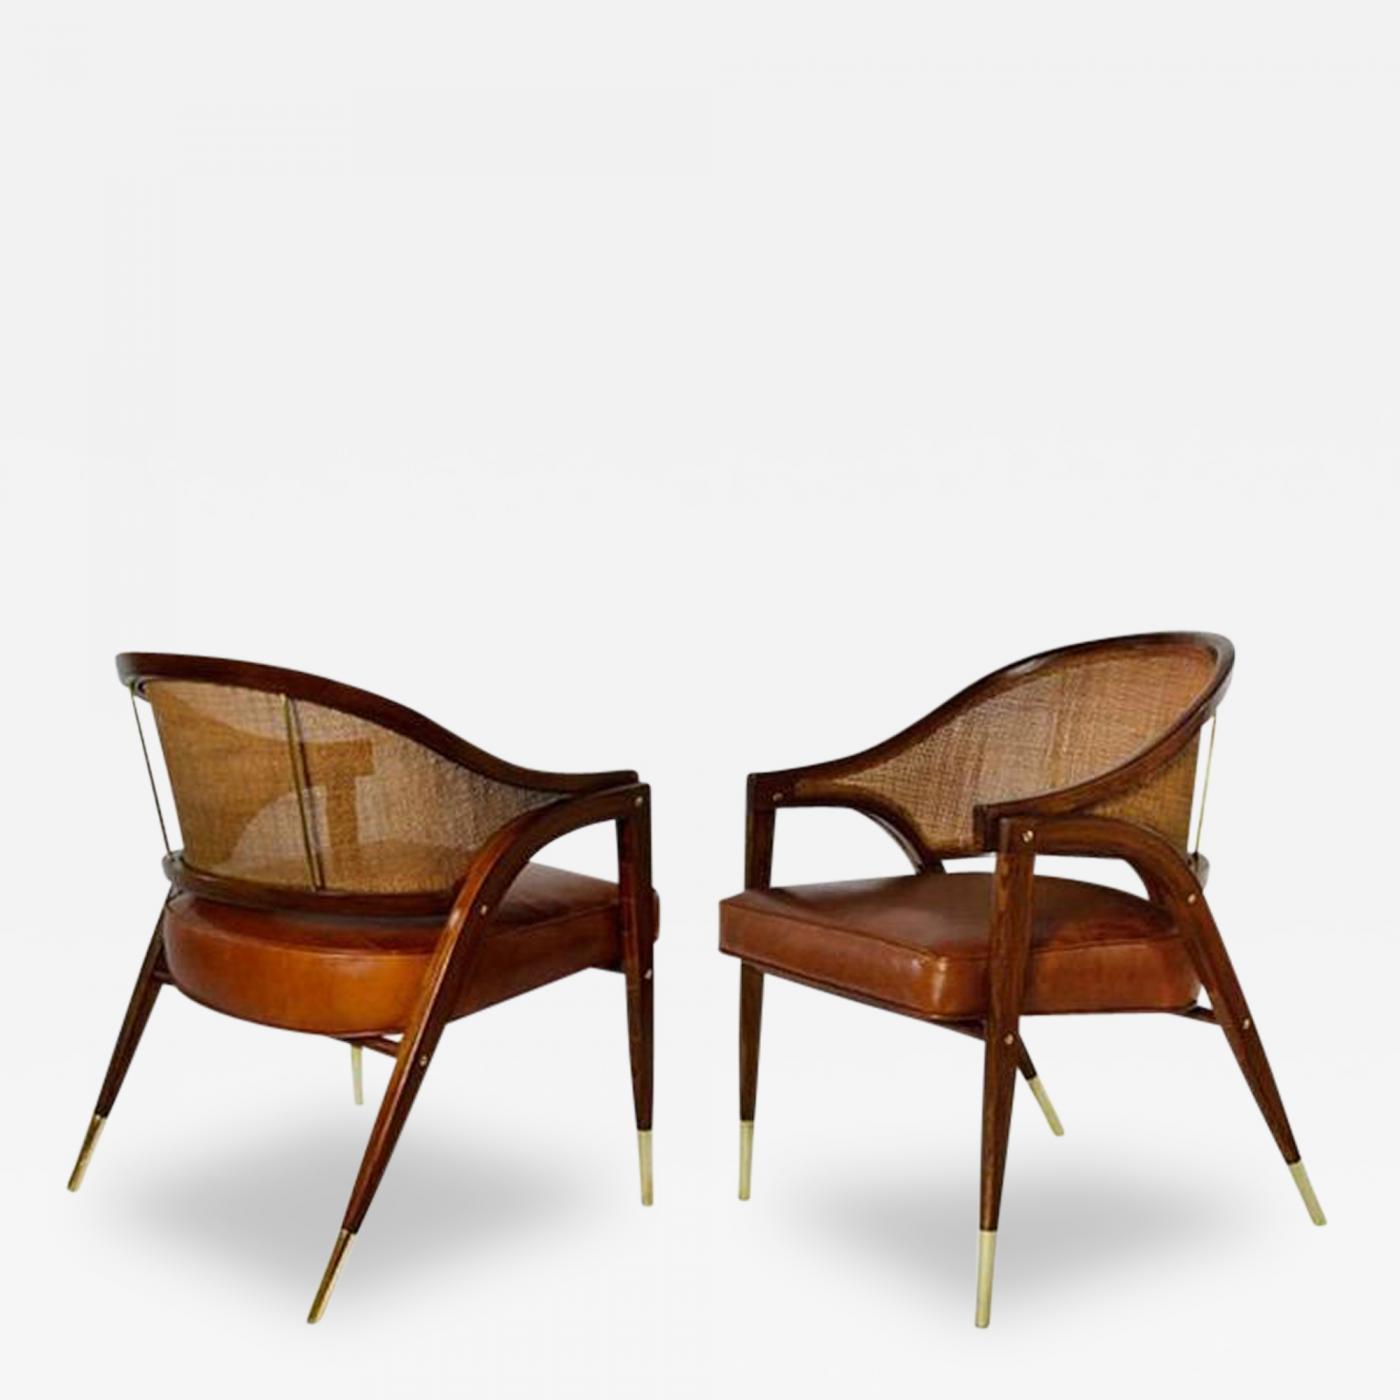 Edward Wormley A Frame Armchairs By Edward Wormley For